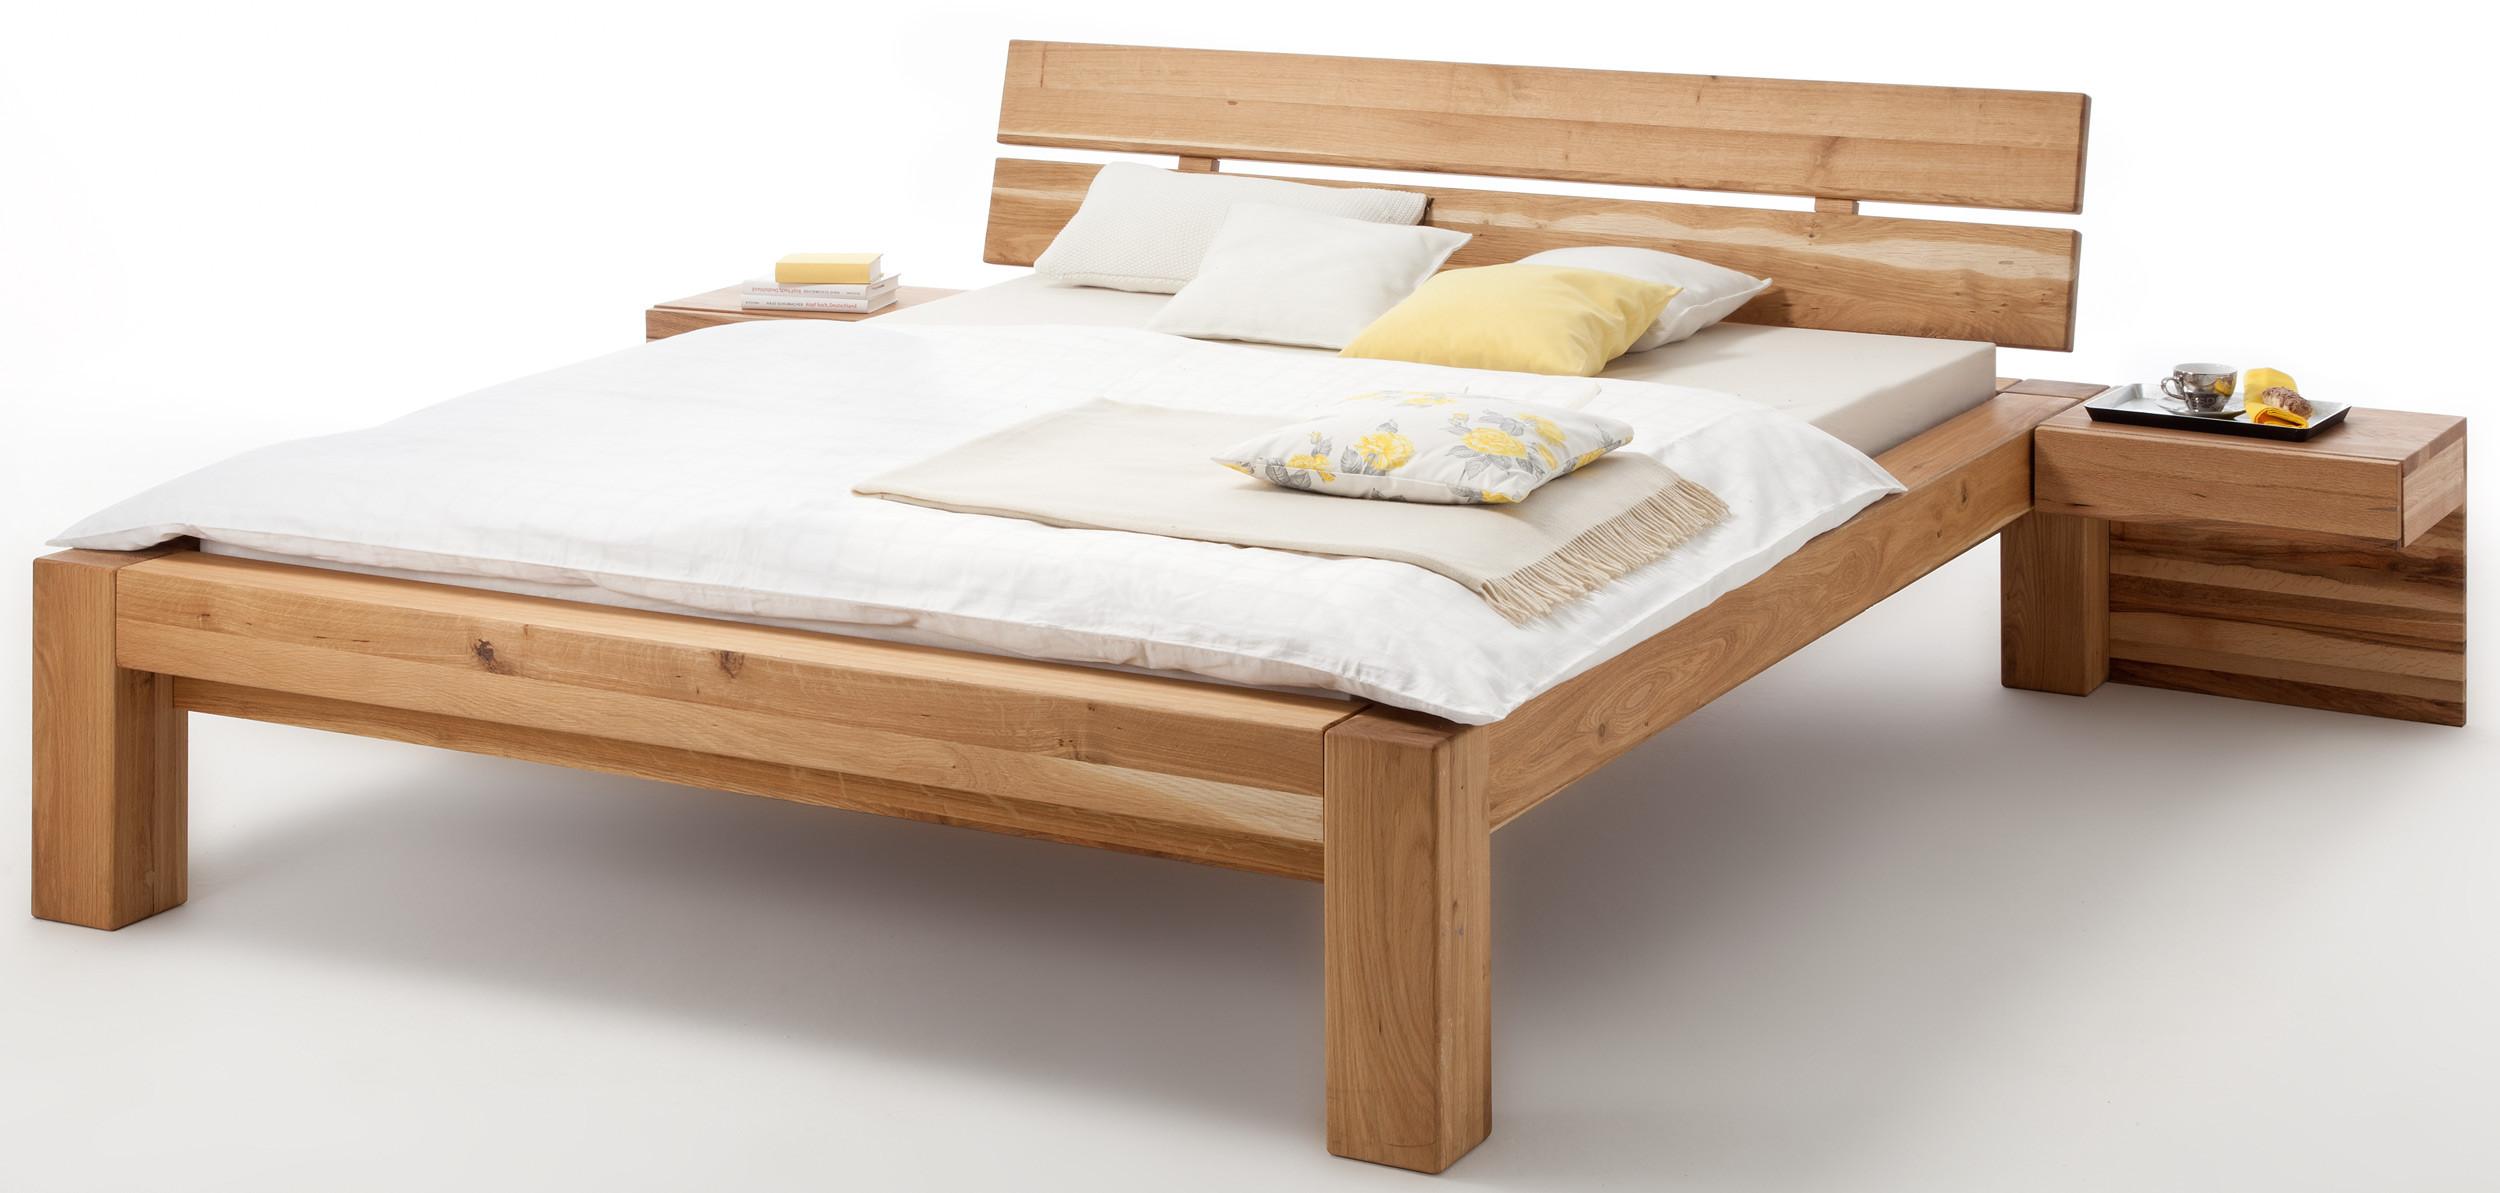 Holzbett 1 40x2 00  Starwood Massivholzbetten Bett Massivholz wildeiche